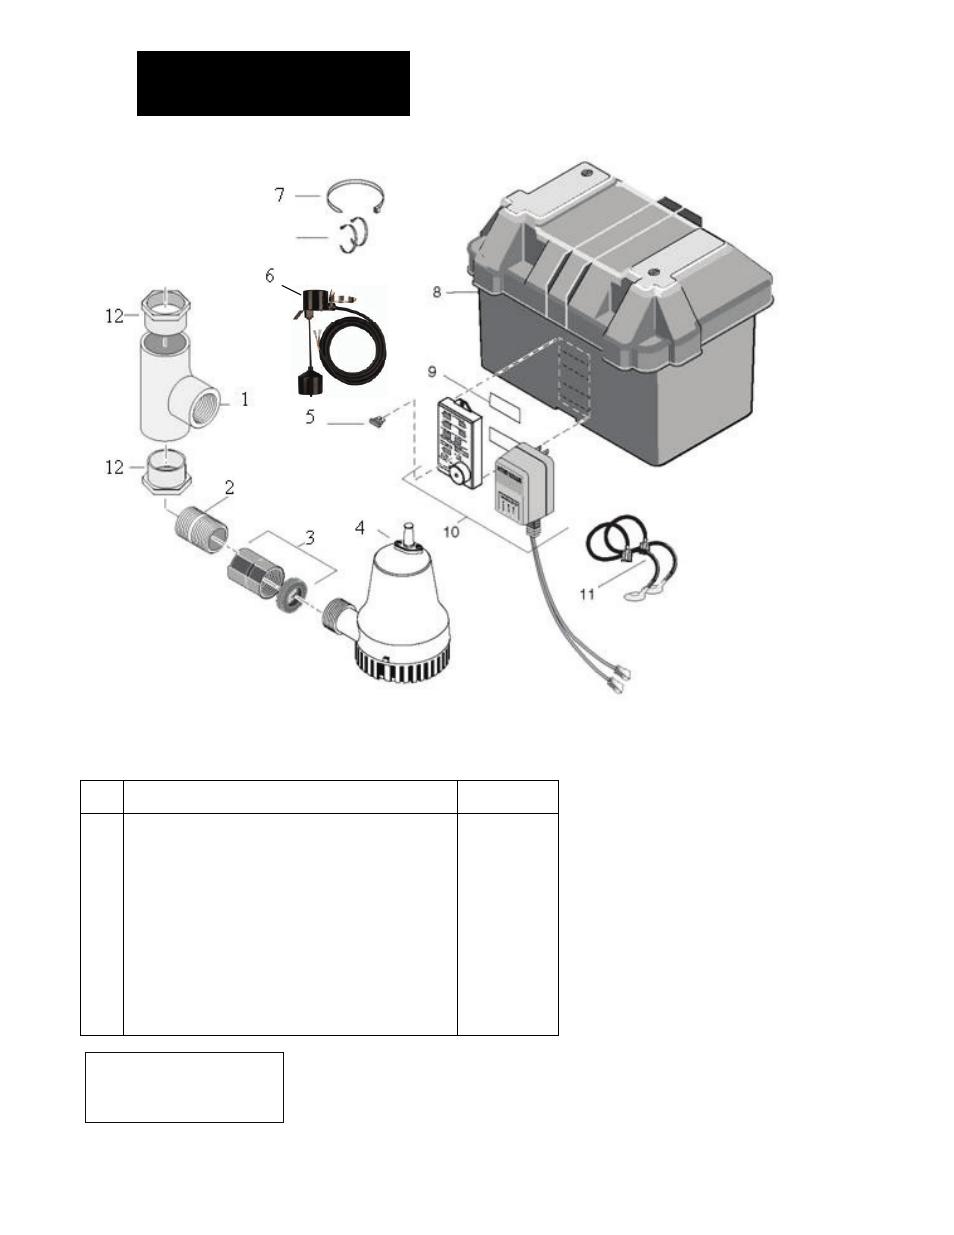 Liberty Pump Wiring Diagram Data Repair Parts Pumps 441 User Manual Page 12 13 Rh Manualsdir Com Control Panel Jeep Fuel